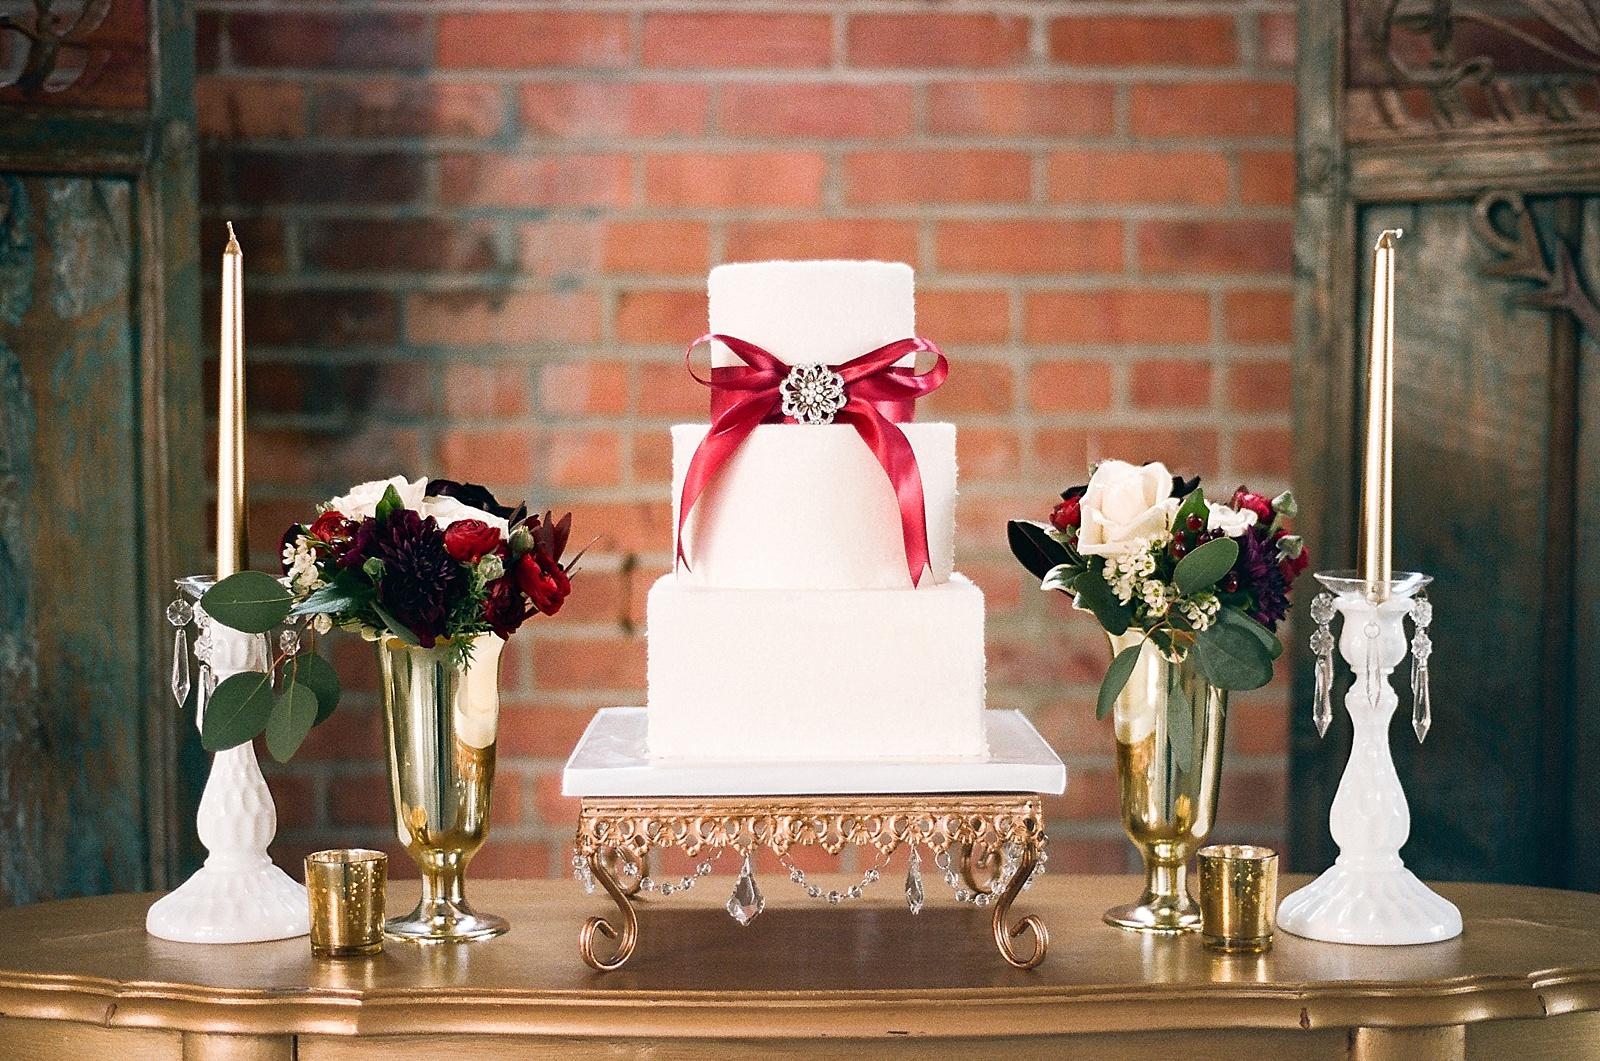 V&V Wedding at 828 by Lauren Nygard_film-003